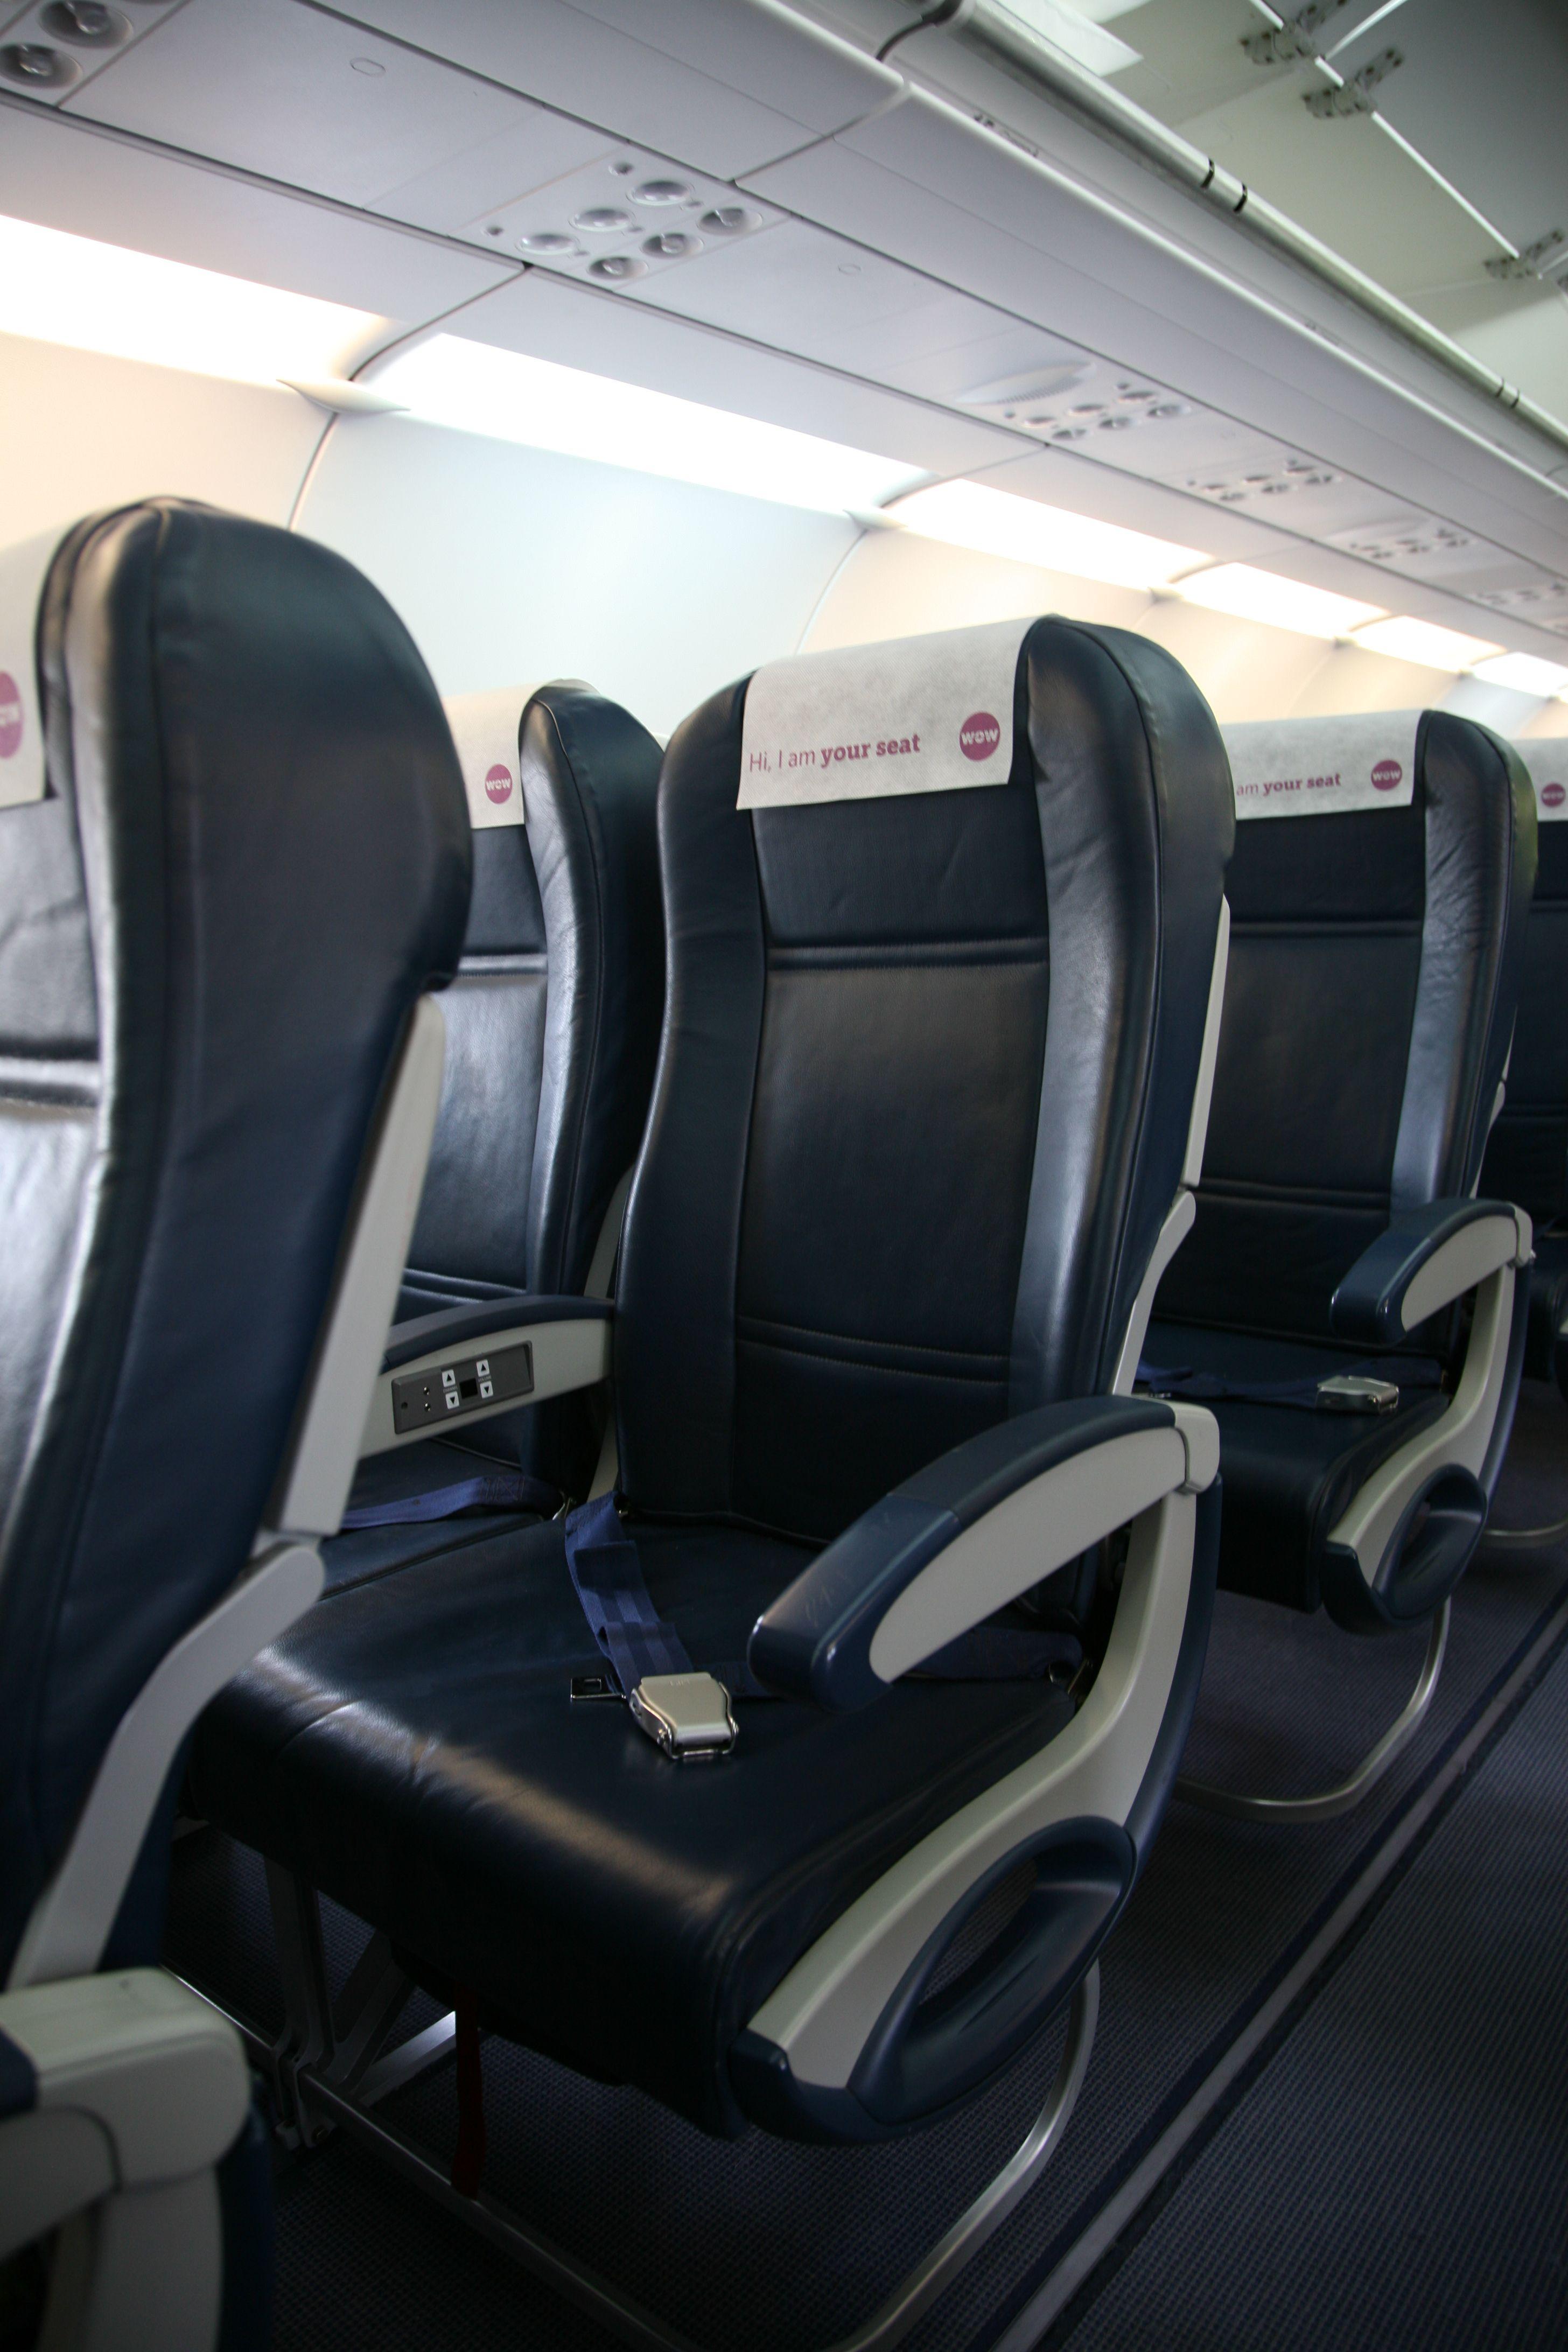 WOW air aircraft interior Wow air, Aircraft interiors